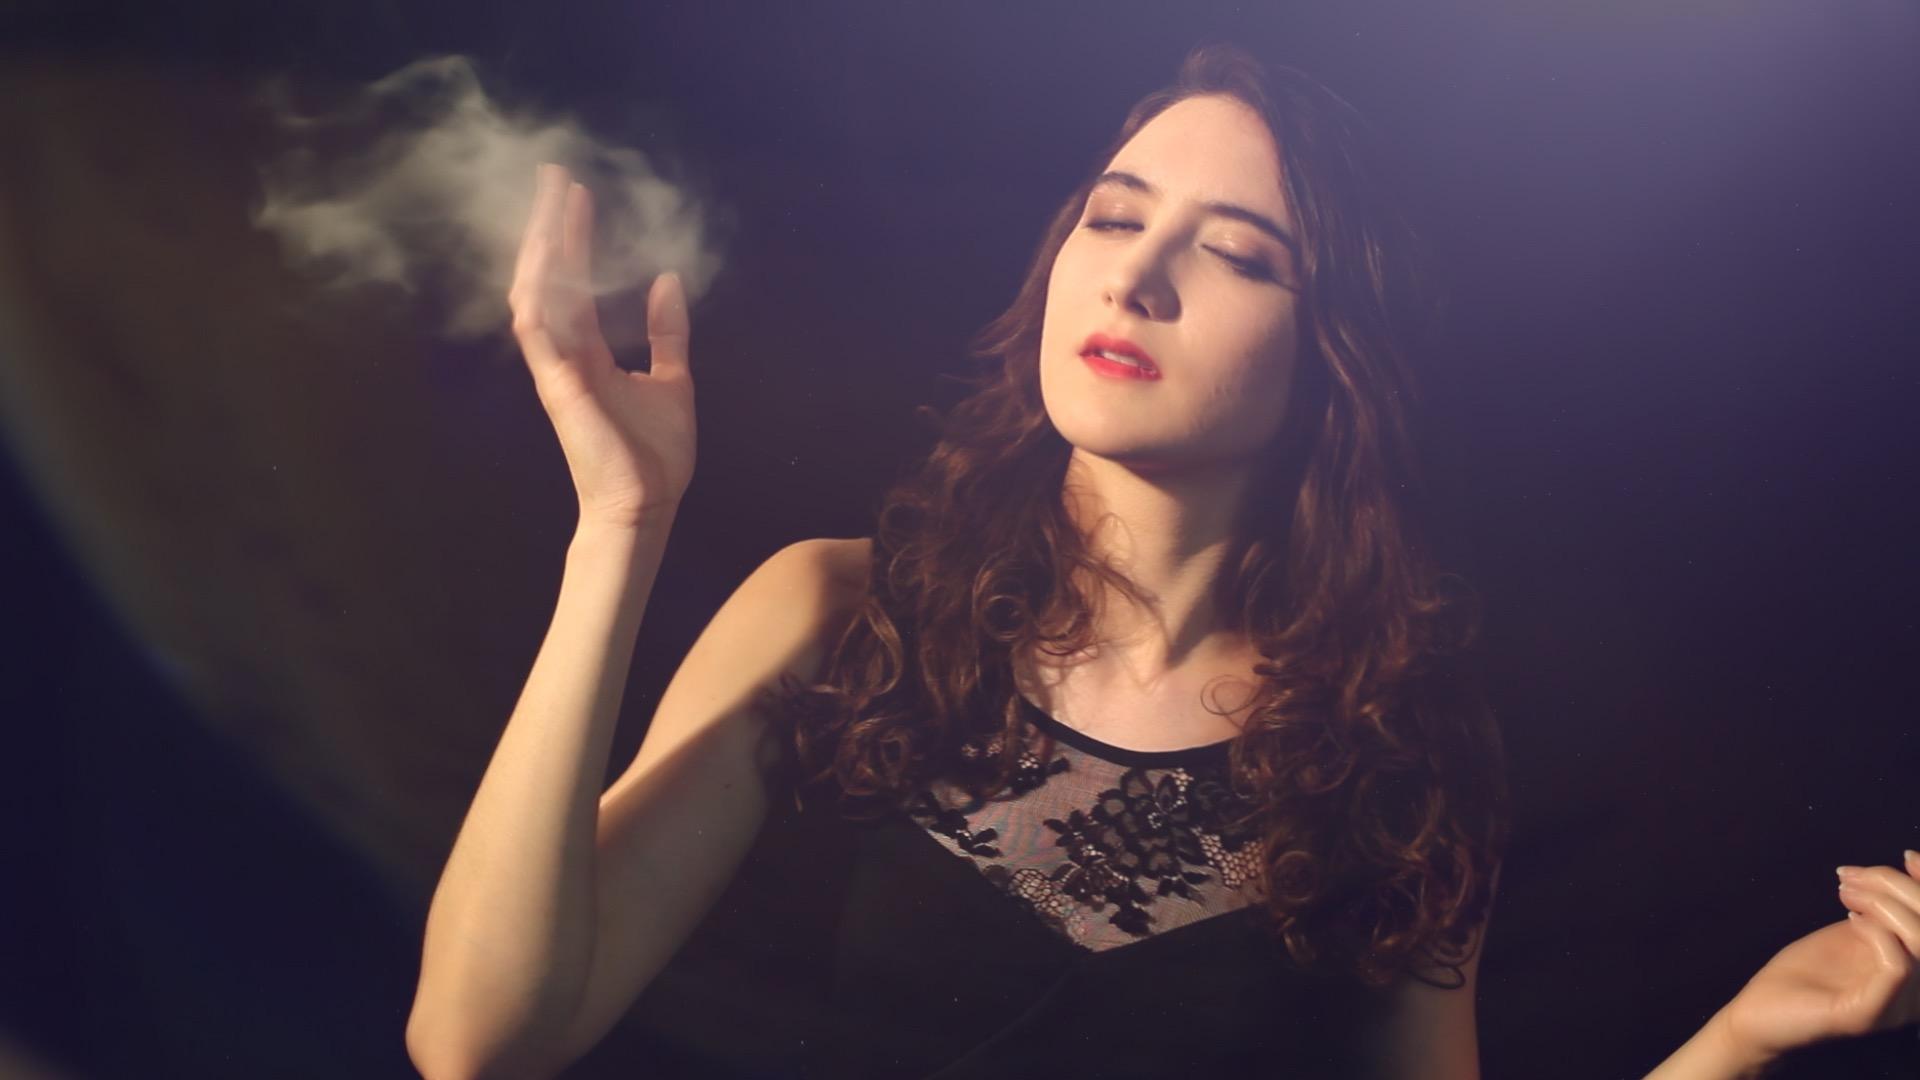 clip – Juste en rêvant – Manon Novak -viviane -riberaigua -realisateur2 music video director